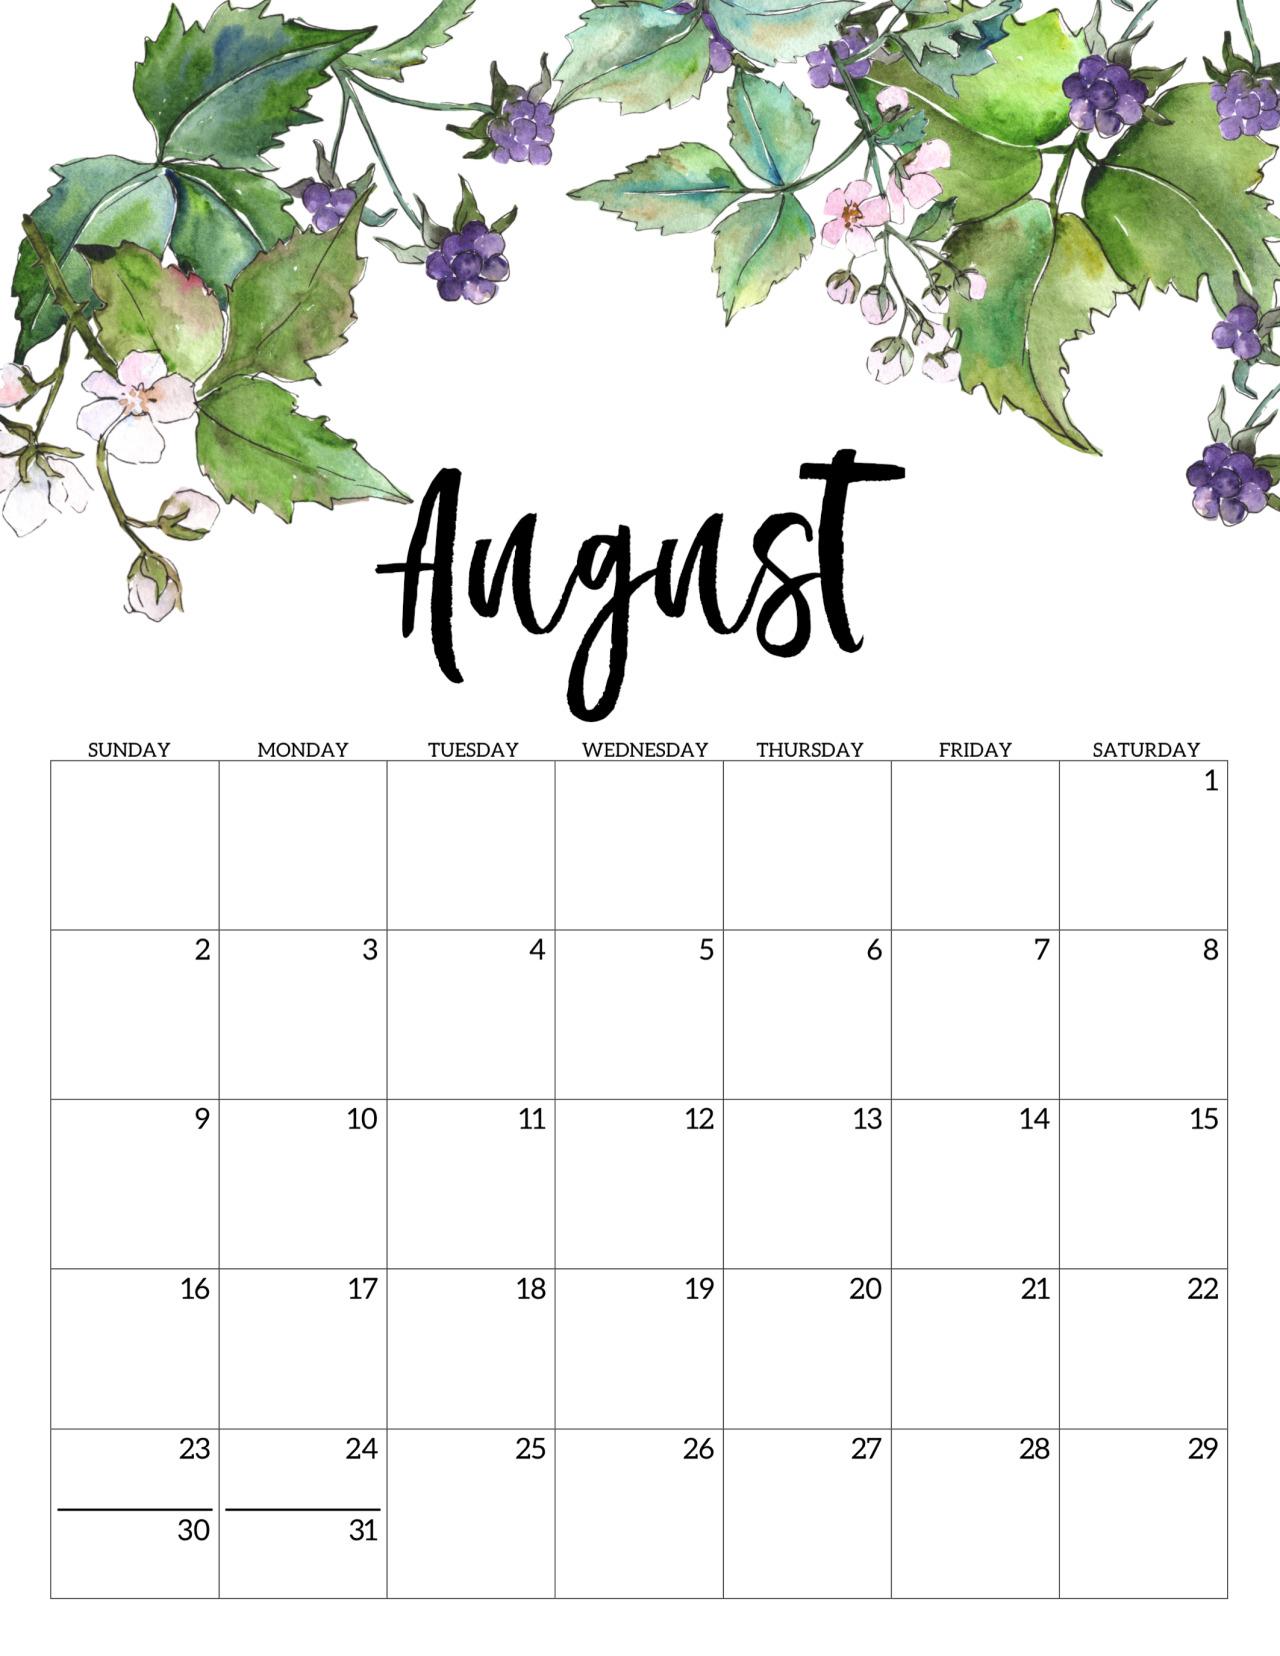 Monthly Printable Calenar intended for Studyblr Calendar 2020